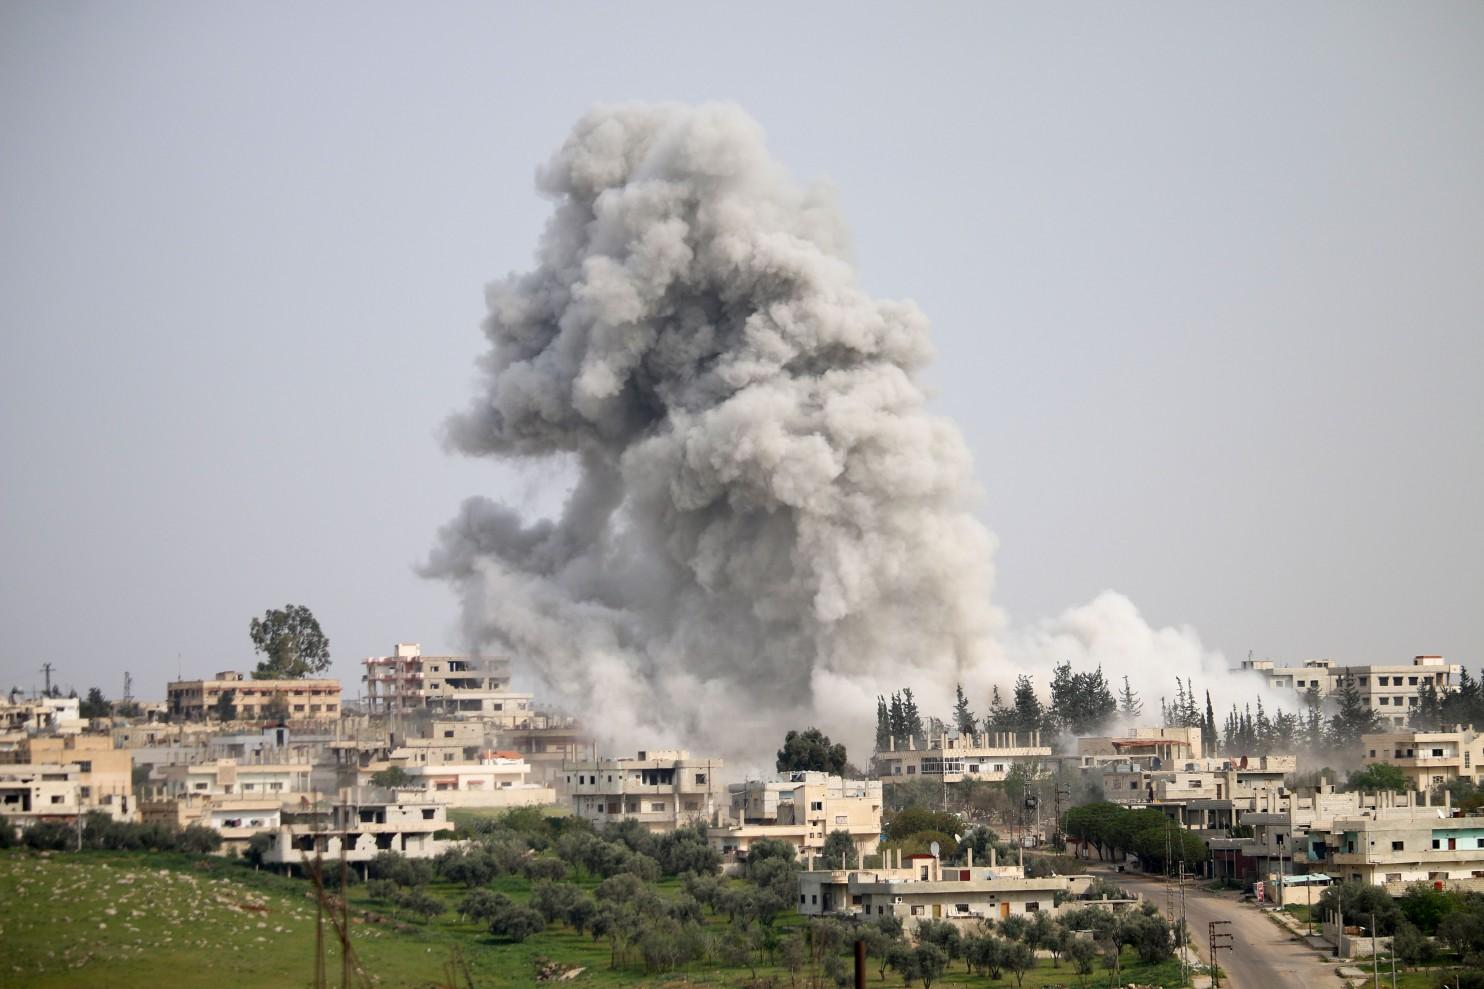 Syria Airstrike (Credit: The Washington Post)